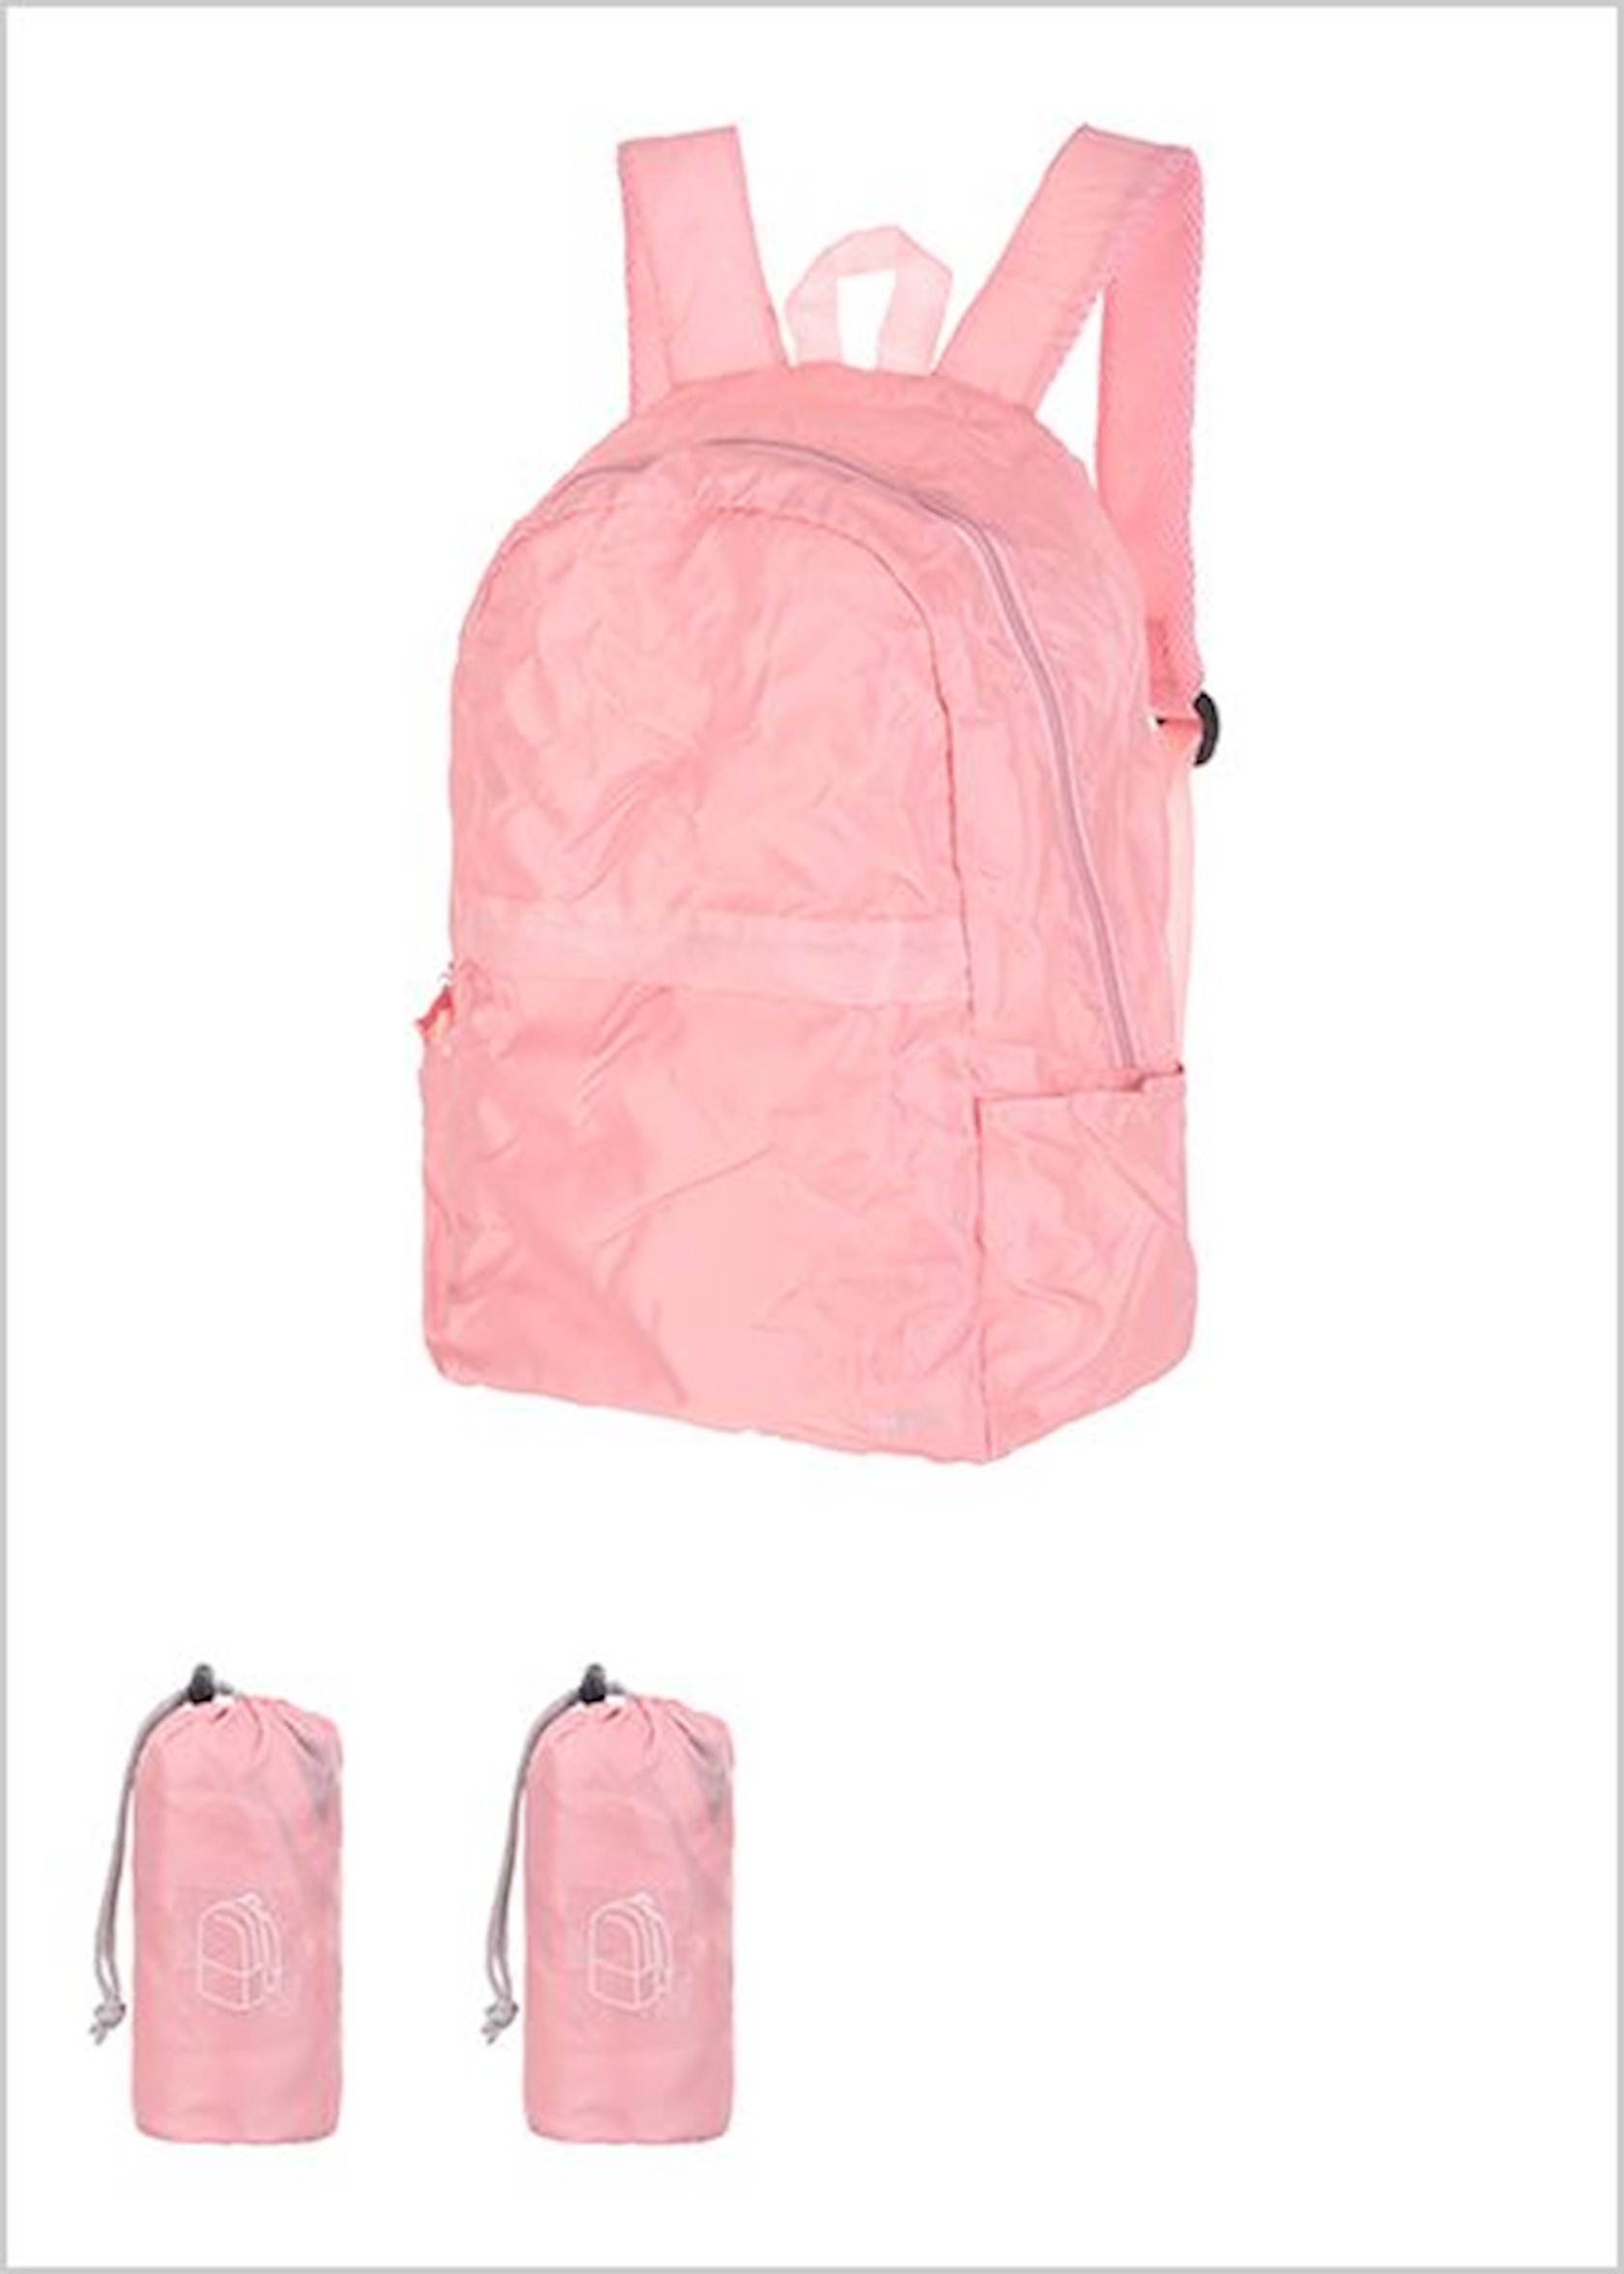 Qatlanan bel çantası Miniso Foldable Backpack(Pink)